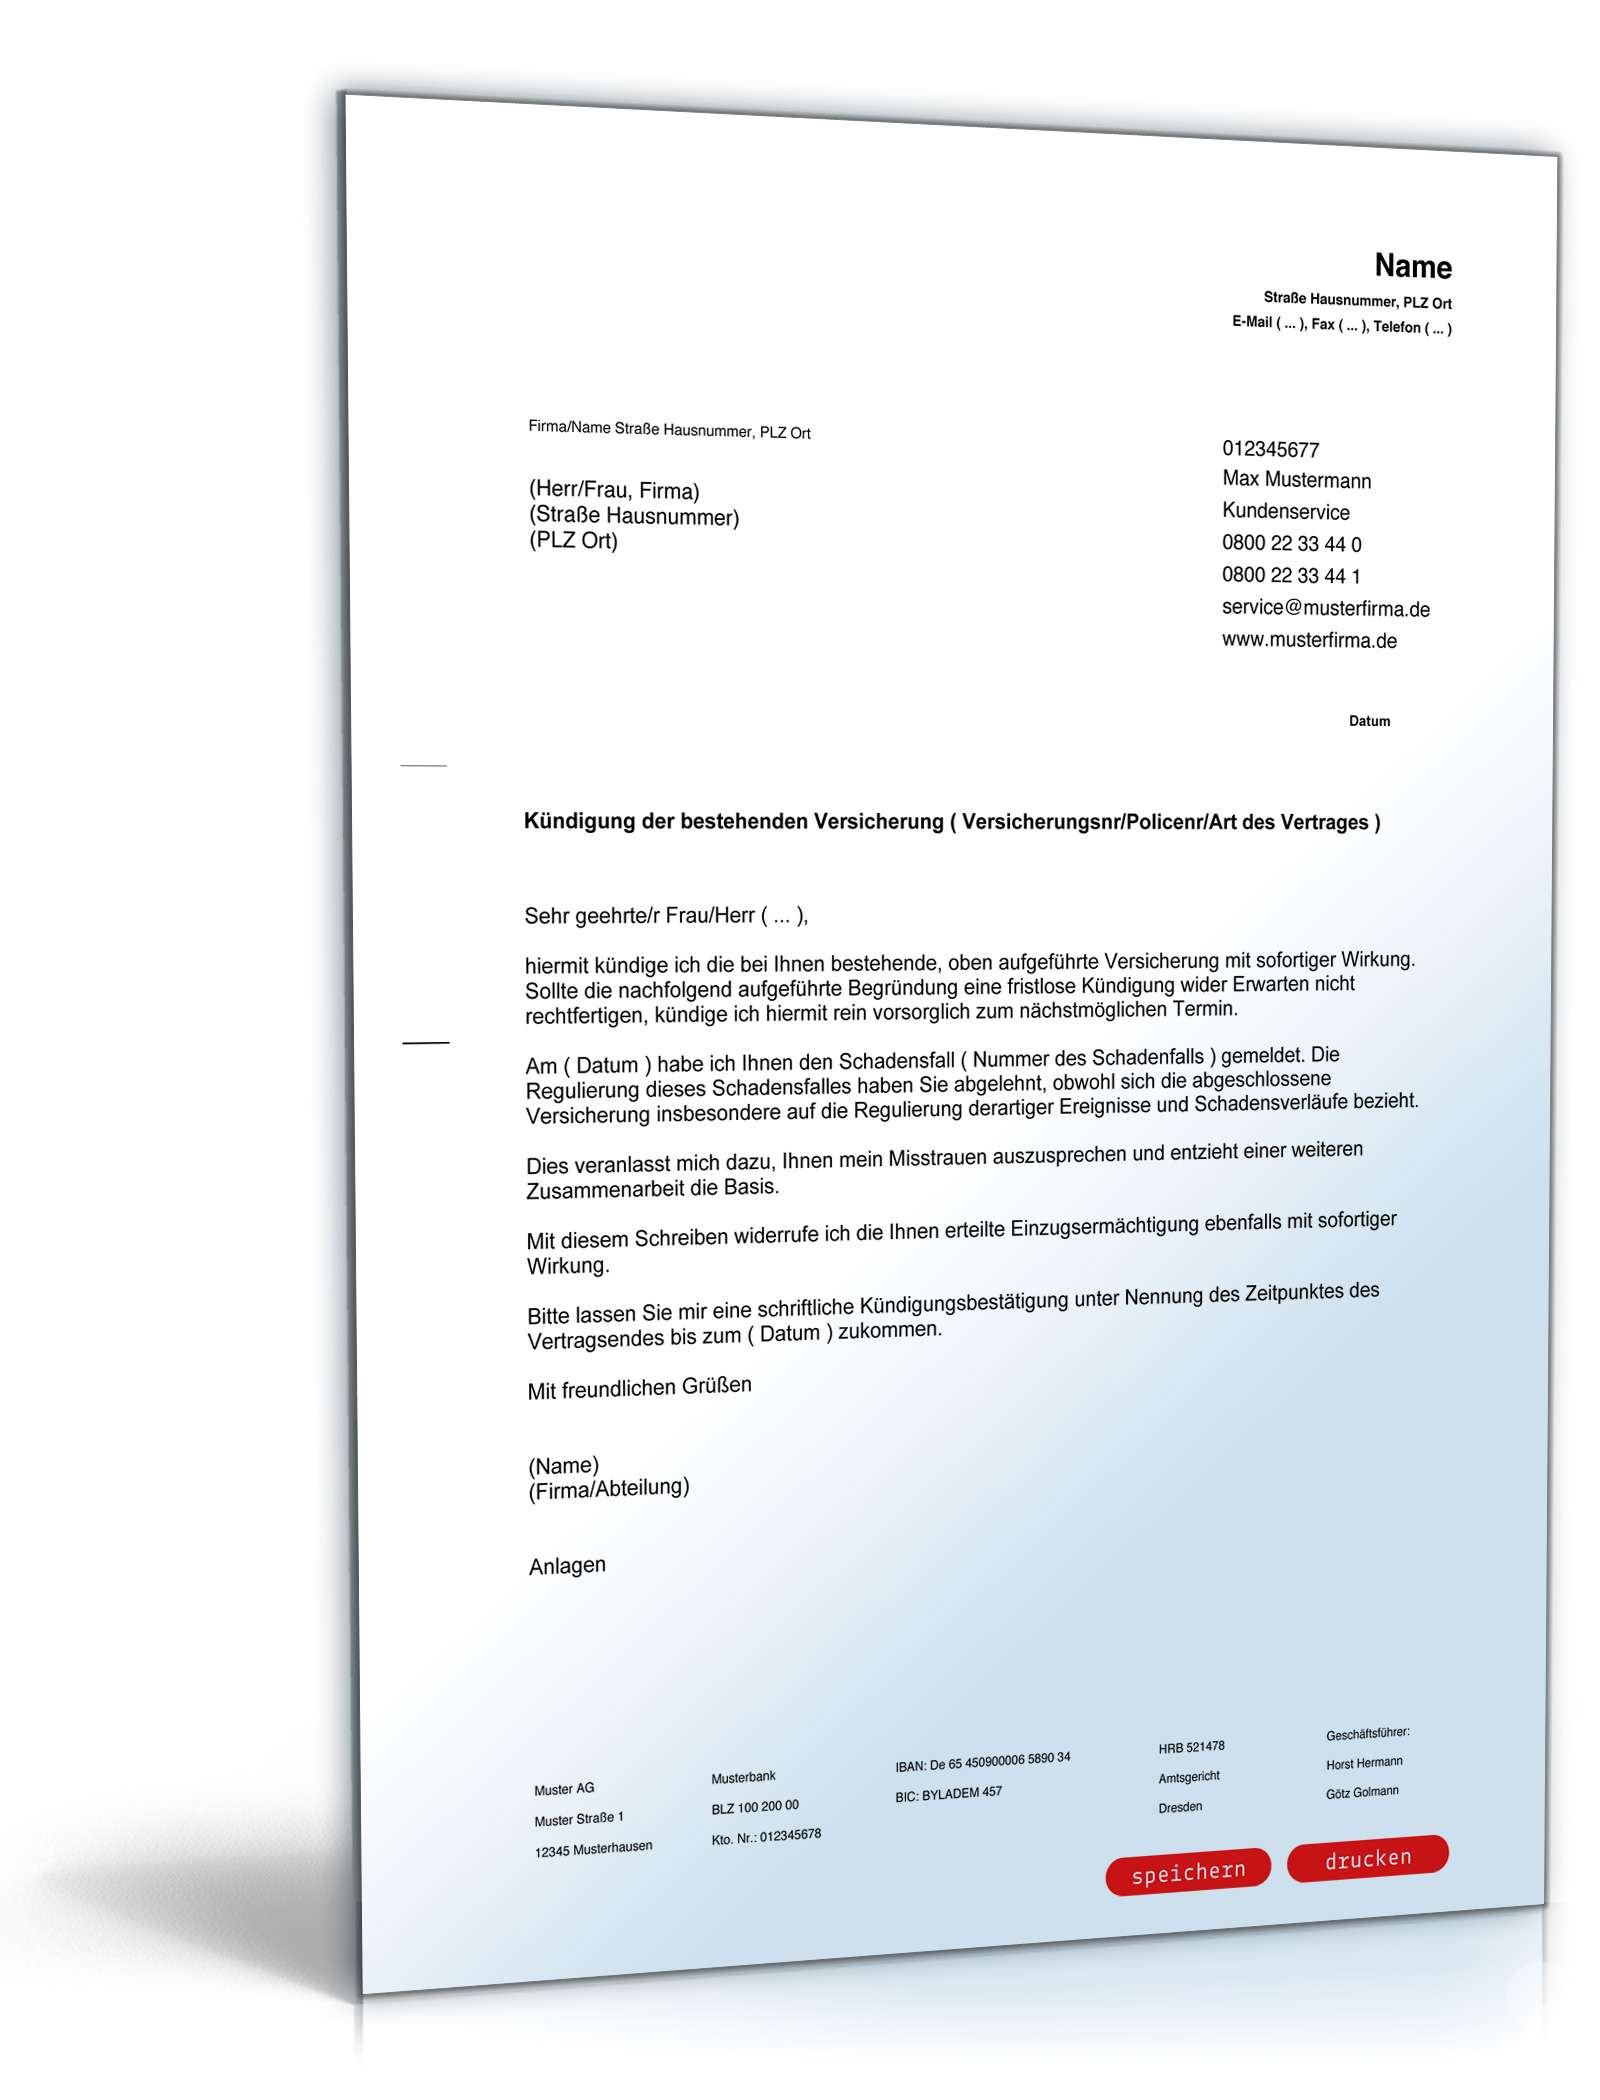 Kündigung Versicherung Muster Zum Download